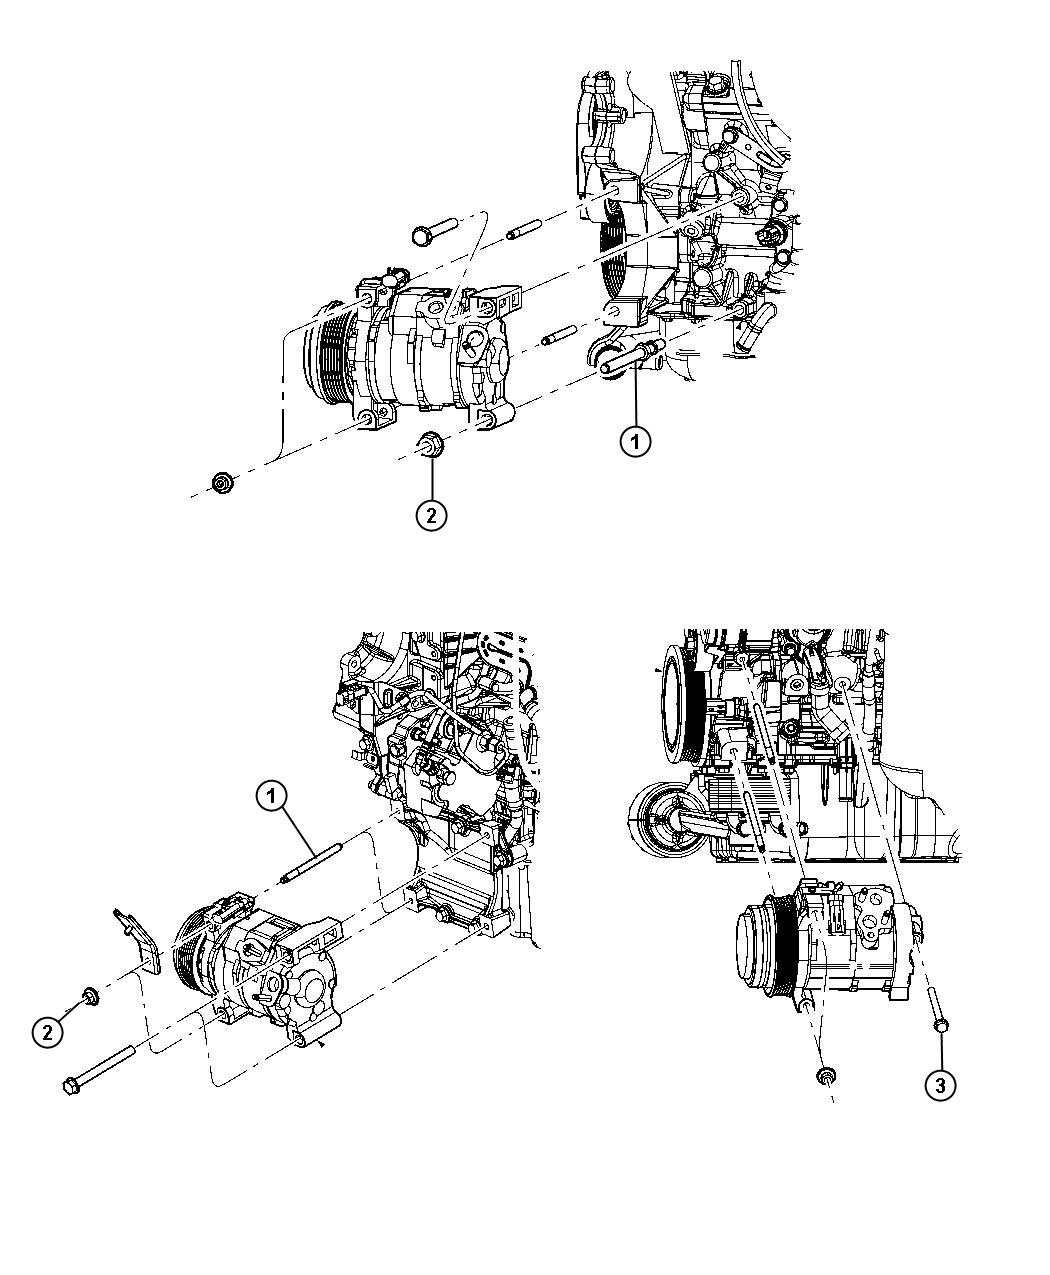 2008 Dodge Caliber SXT 2.0L 4 Cyl CVT Nut. Hex flange. M8